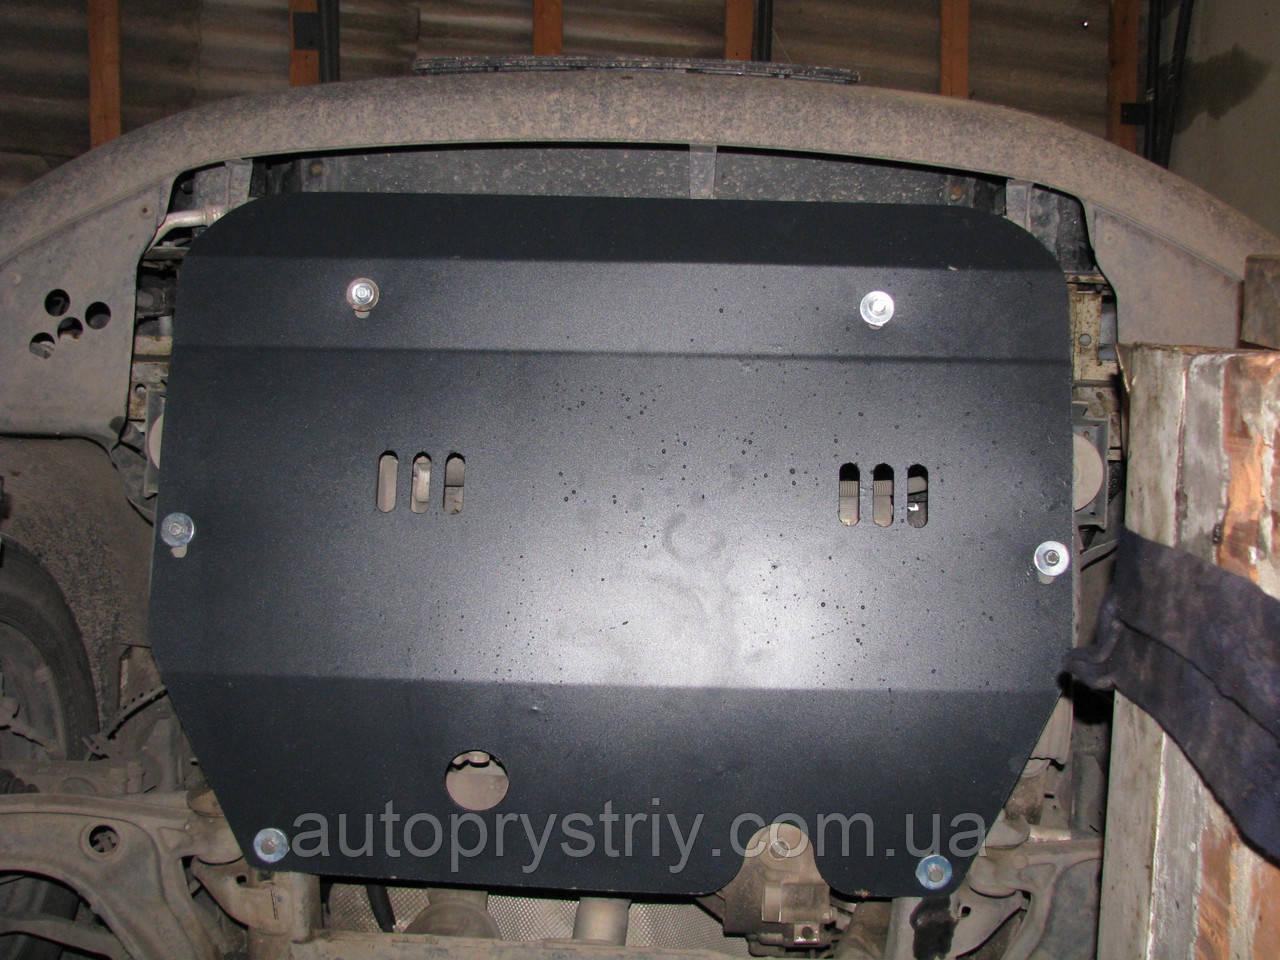 Захист двигуна і КПП Volkswagen Transporter T-6 (2009--) механіка 1.9 D